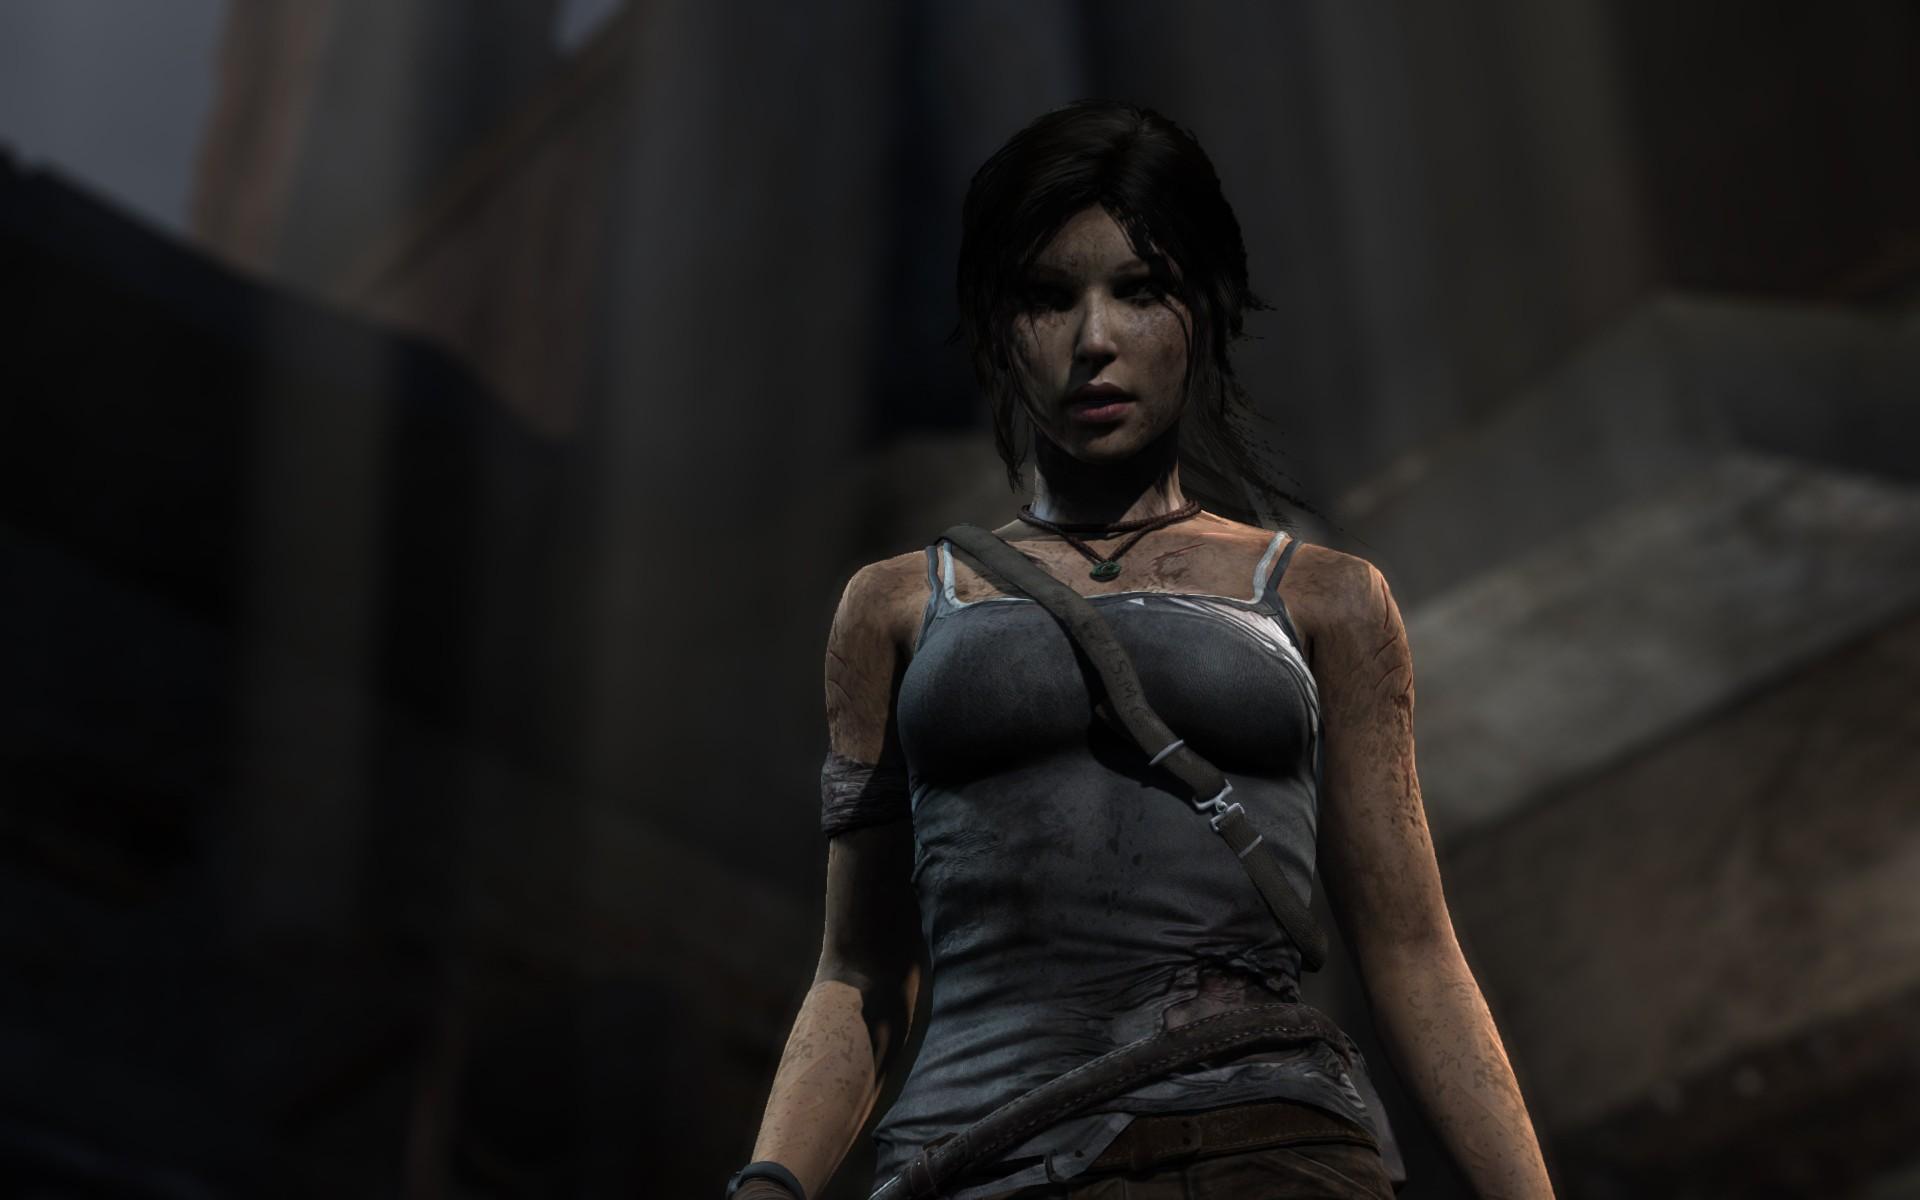 Wallpaper Video Games Model Cgi Fashion Lara Croft Tomb